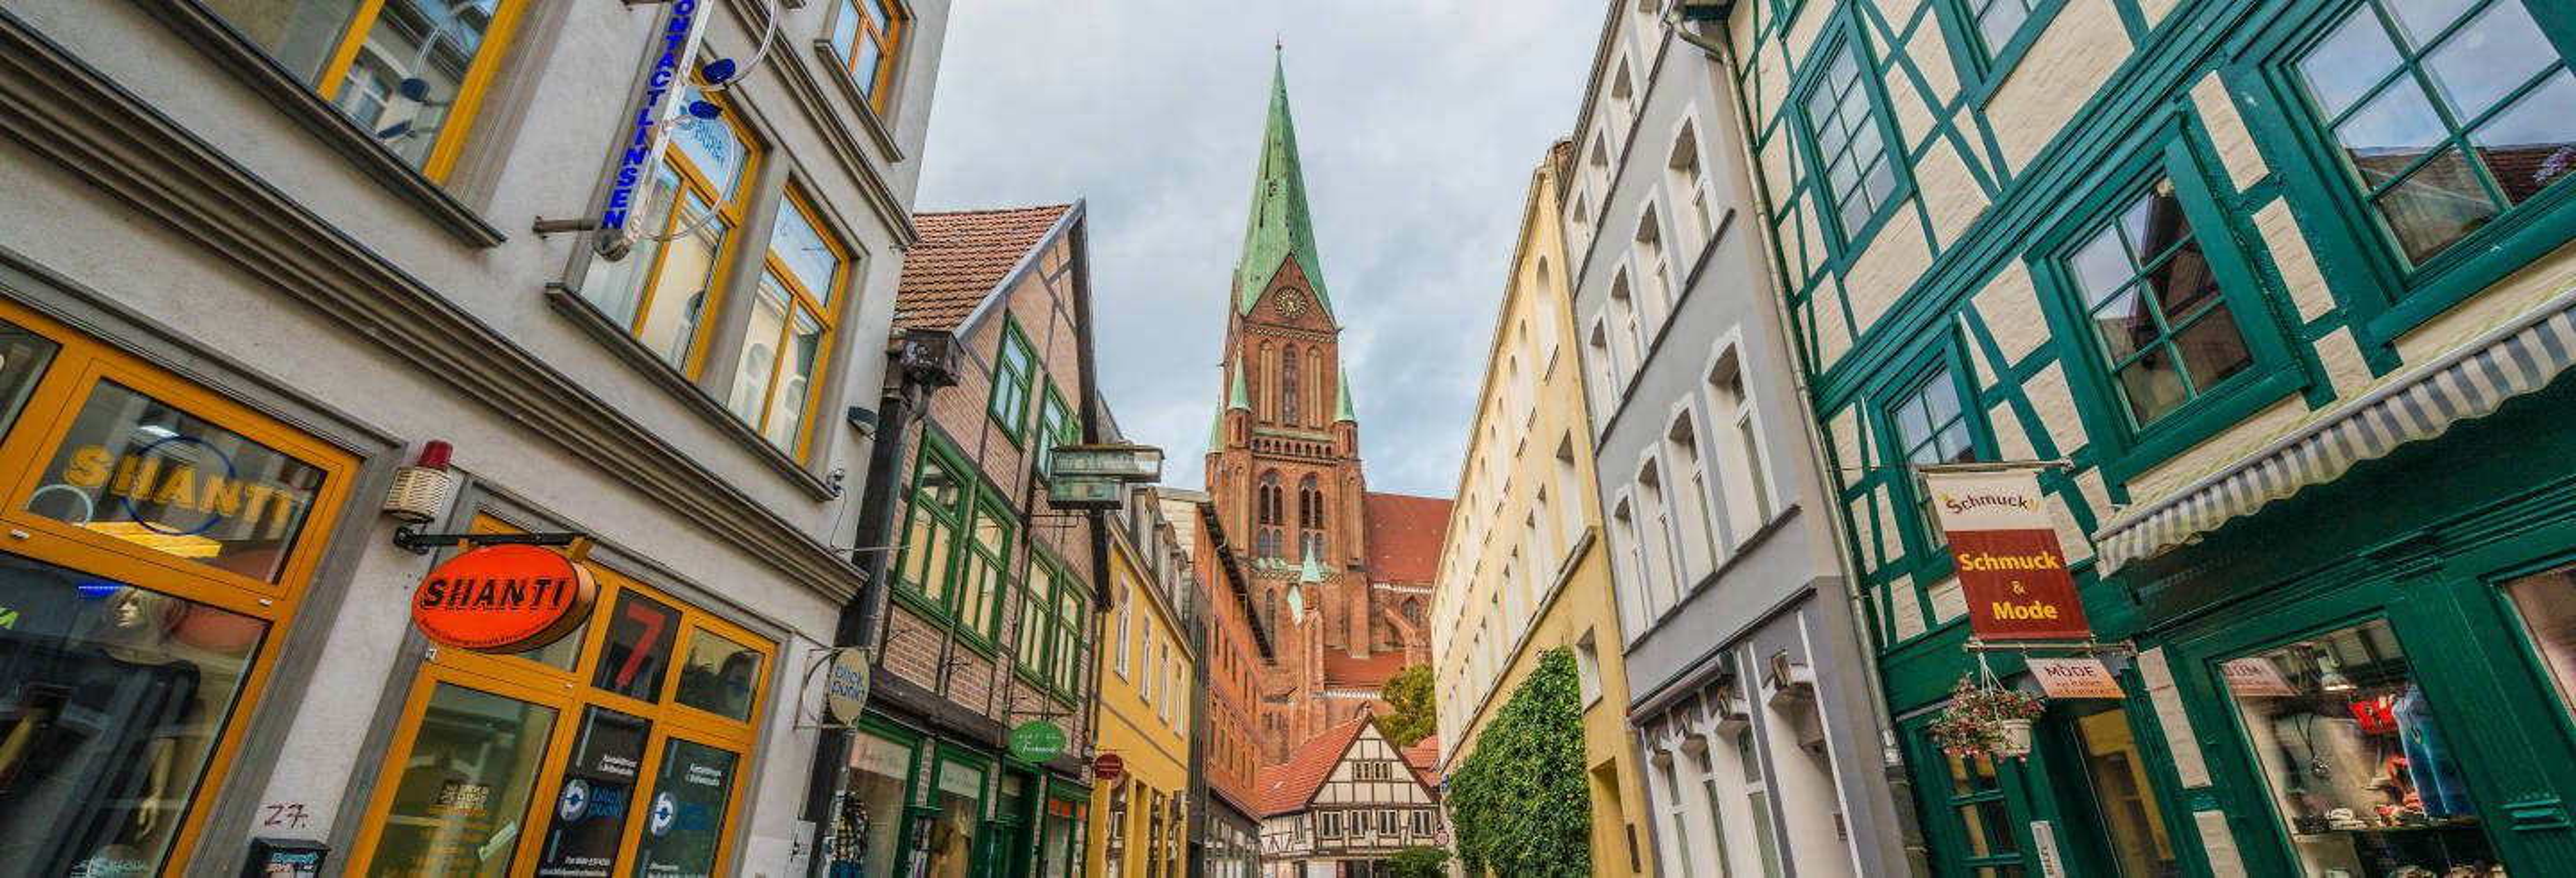 Tour privado por Schwerin con guía en español